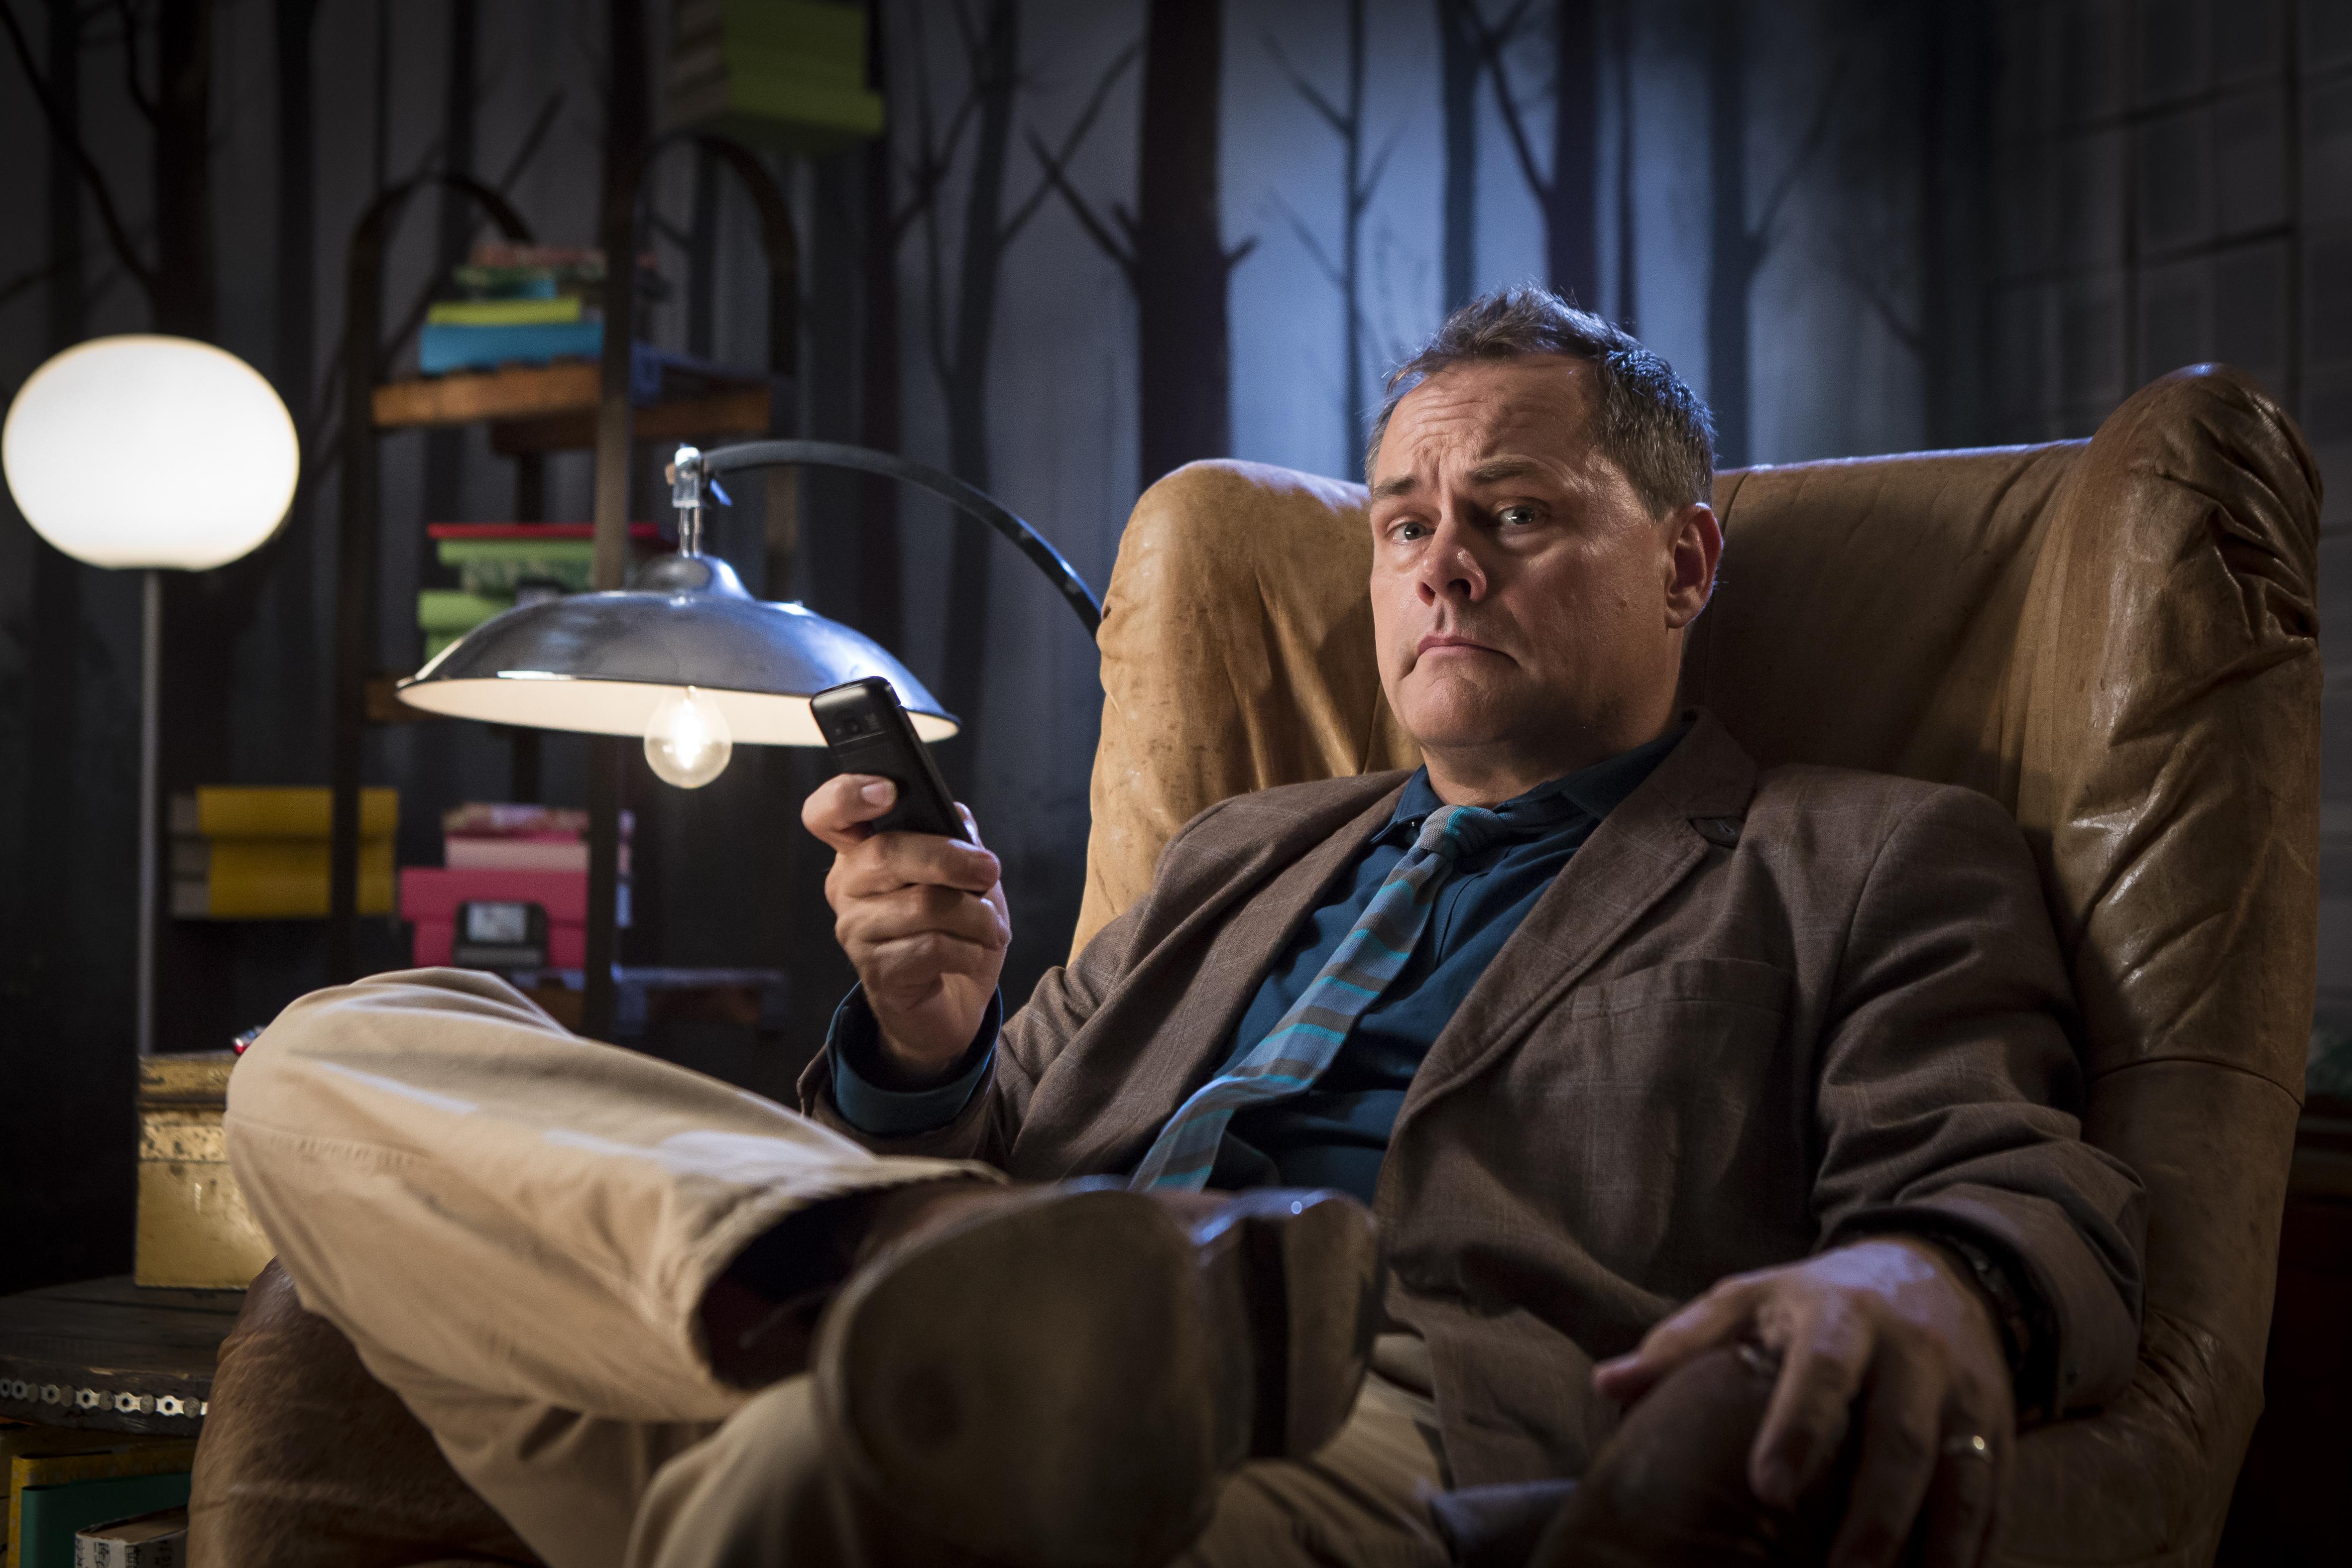 Crackanory – Episode 1: Jack Dee who reads BitterTweet